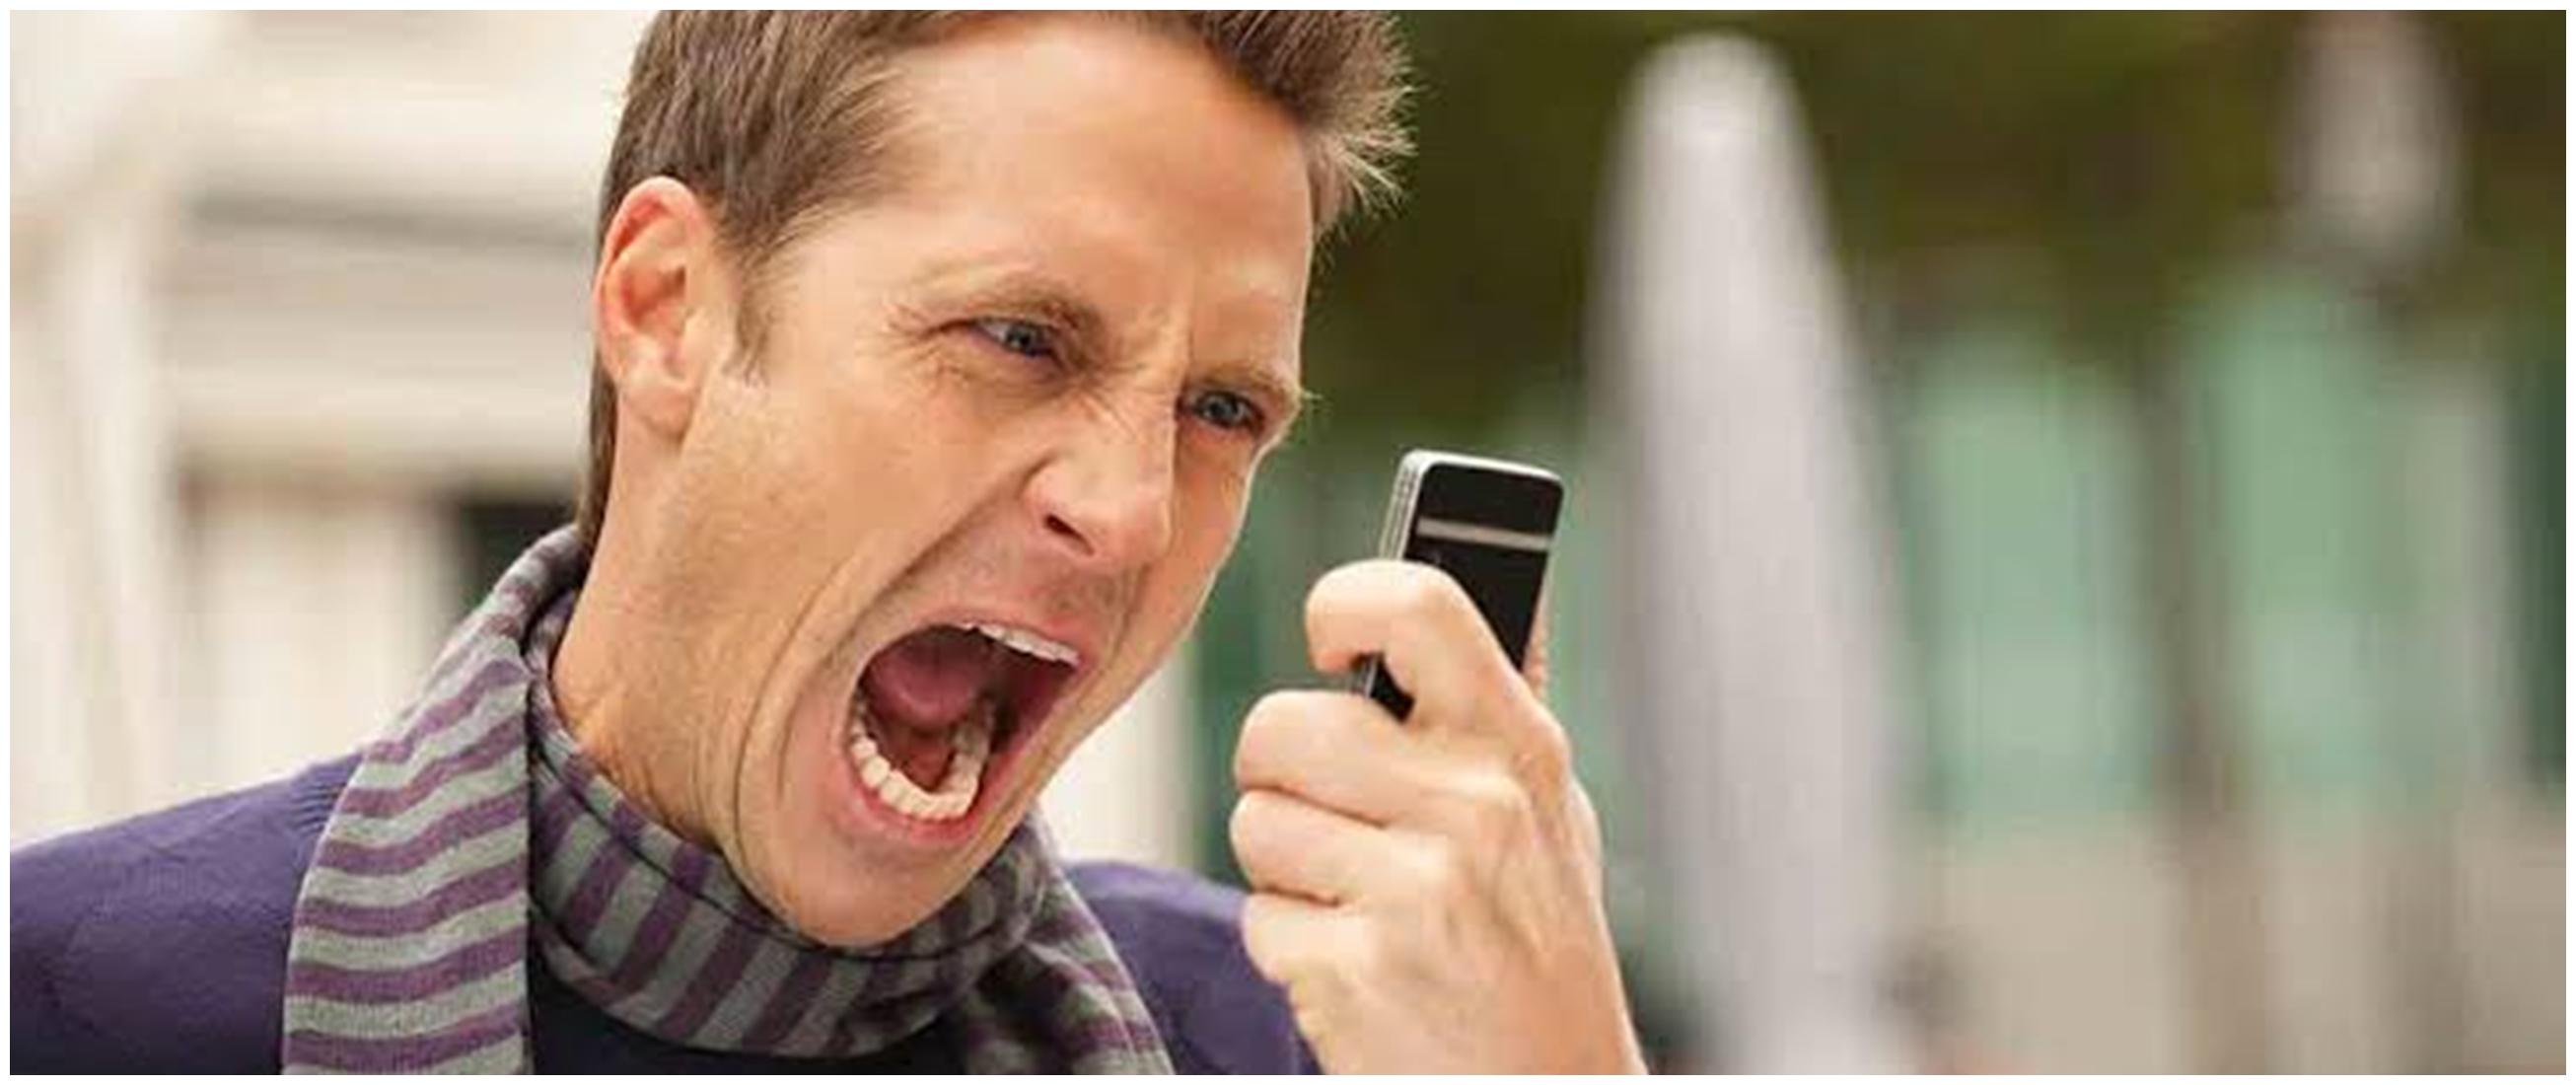 10 Cara merawat smartphone agar awet, aman nge-game seharian